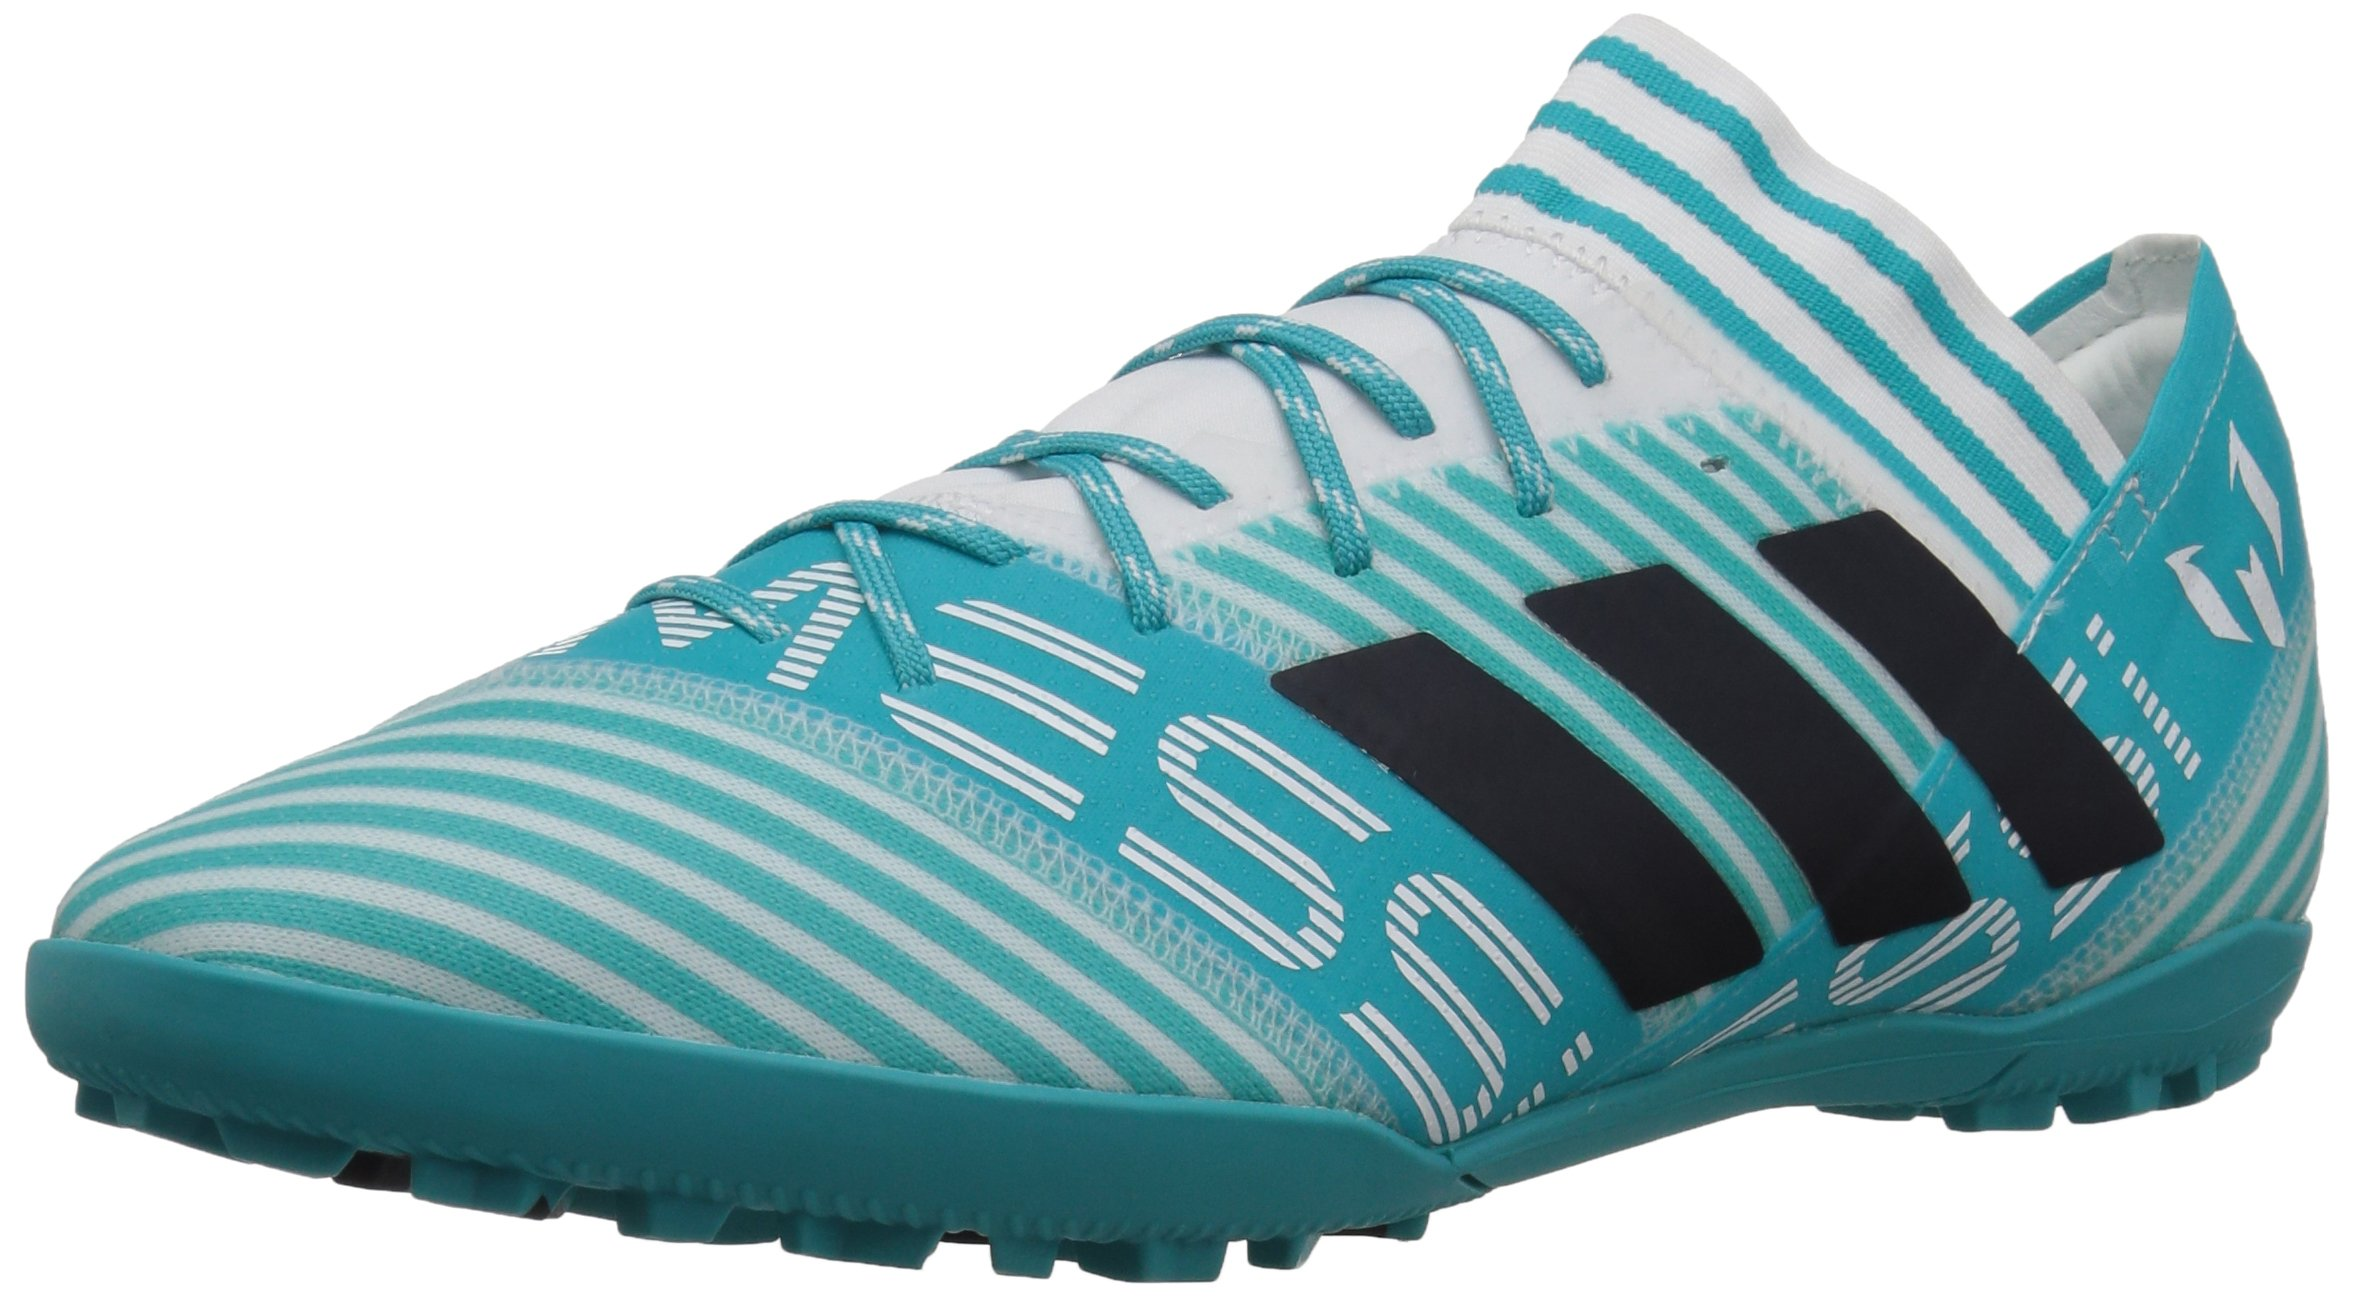 adidas nemeziz messi messi nemeziz tango tf soccer hommes Chaussure Blanc  / légende 683488